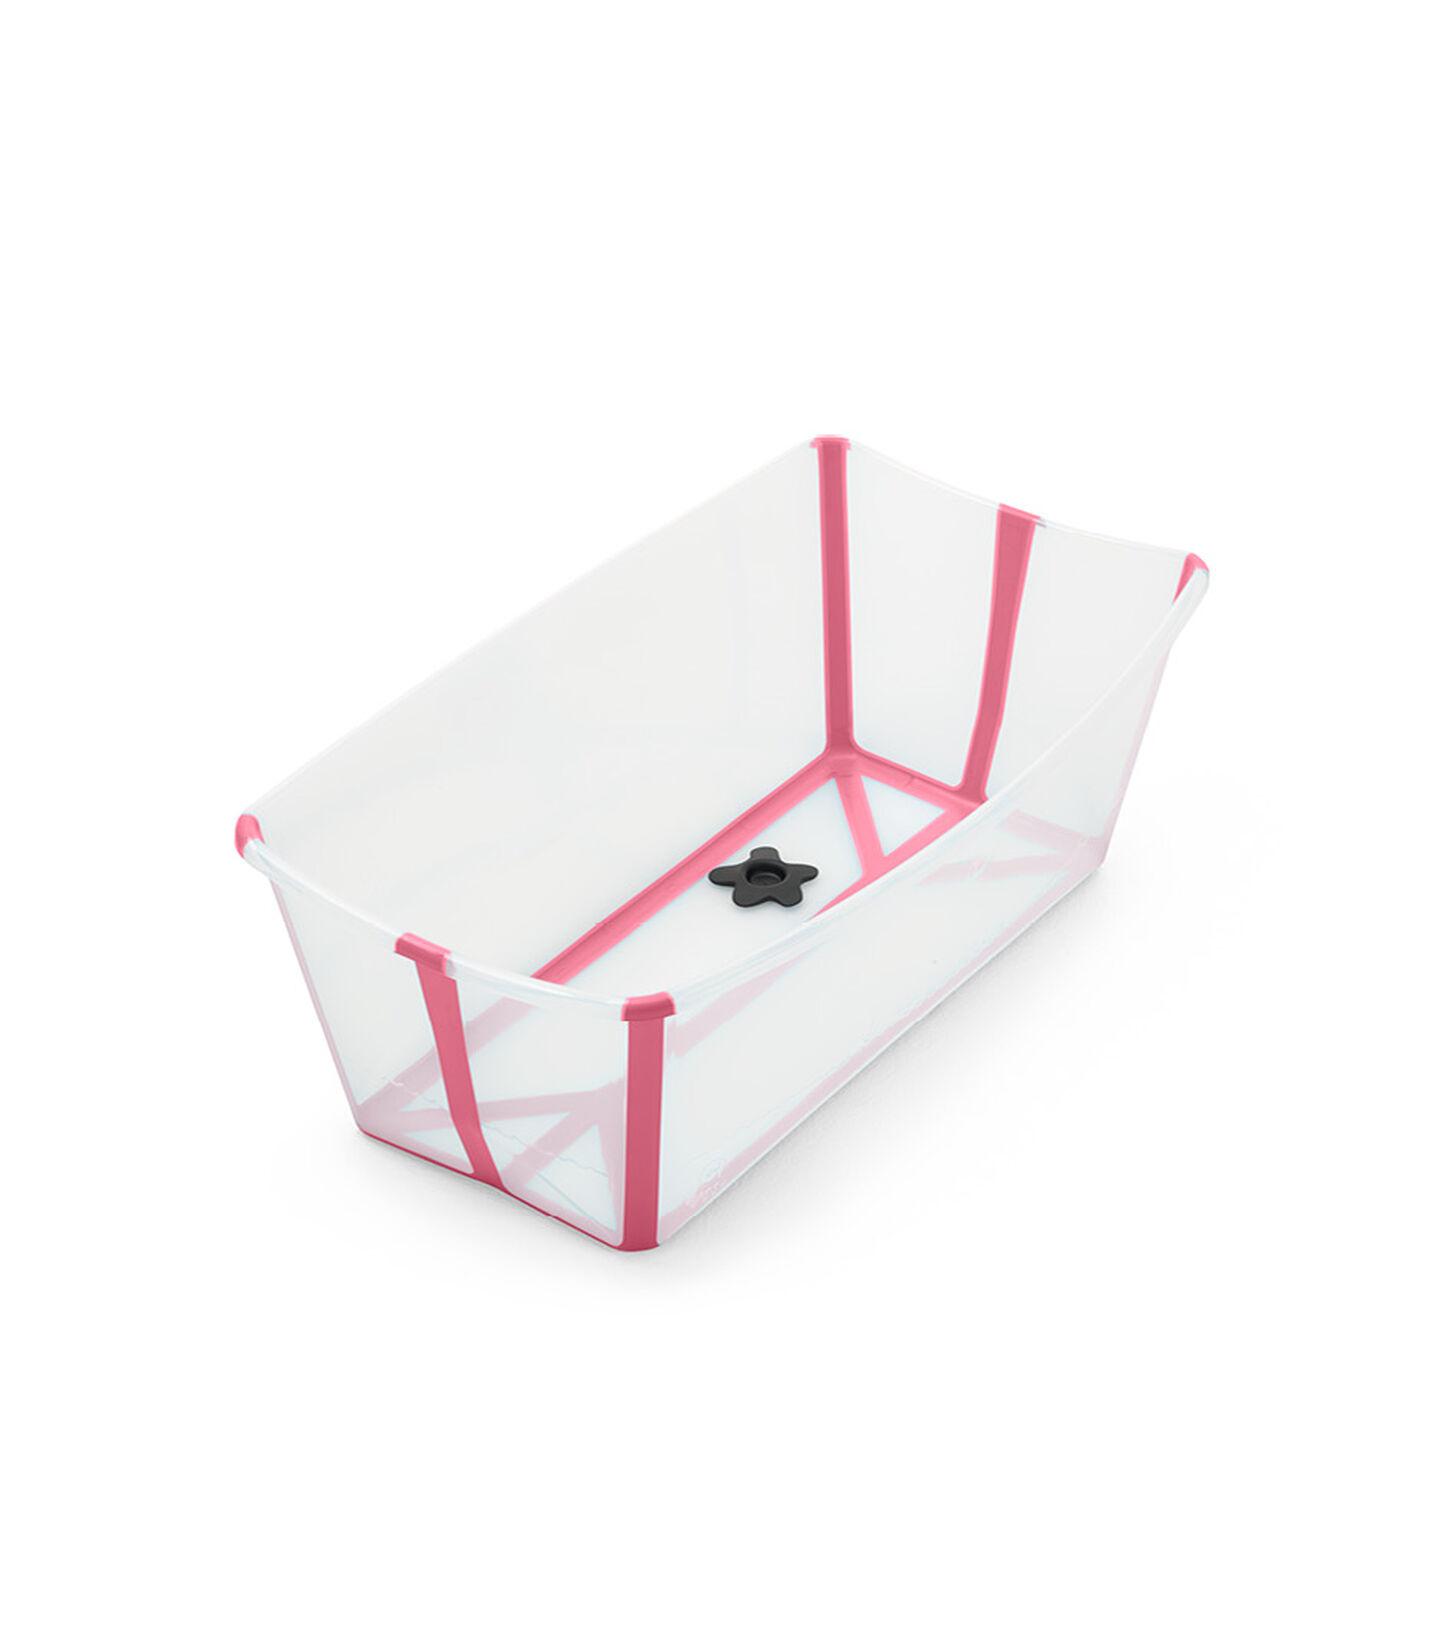 Stokke® Flexi Bath® Heat Trans Pink, Transparent rose, mainview view 2